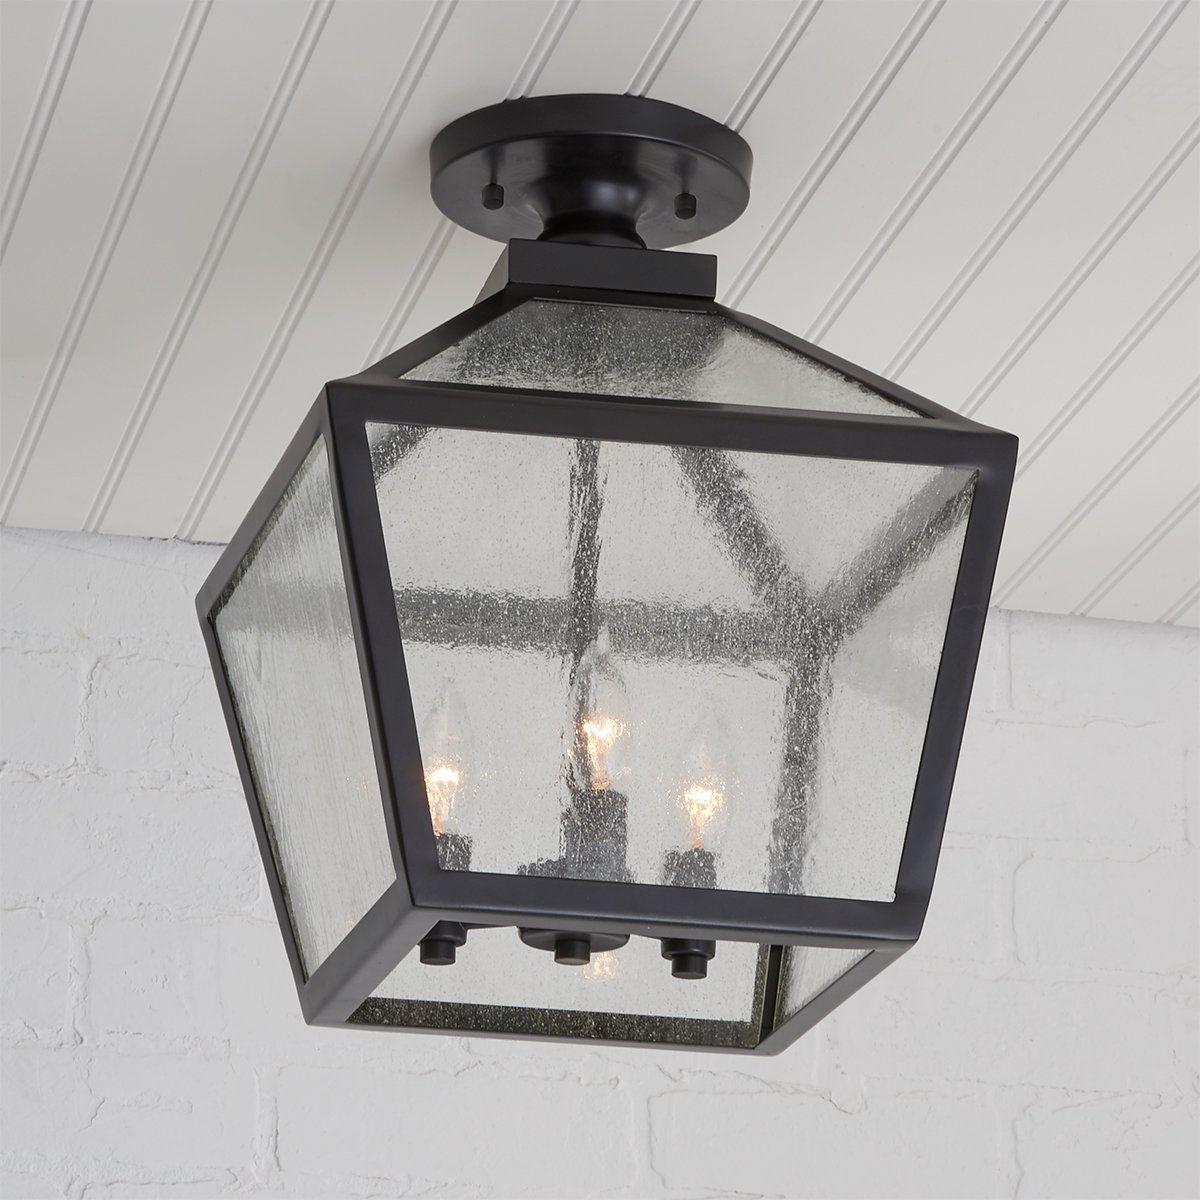 Shenandoah Outdoor Ceiling Light Porch Light Fixtures Ceiling Lights Ceiling Mount Light Fixtures